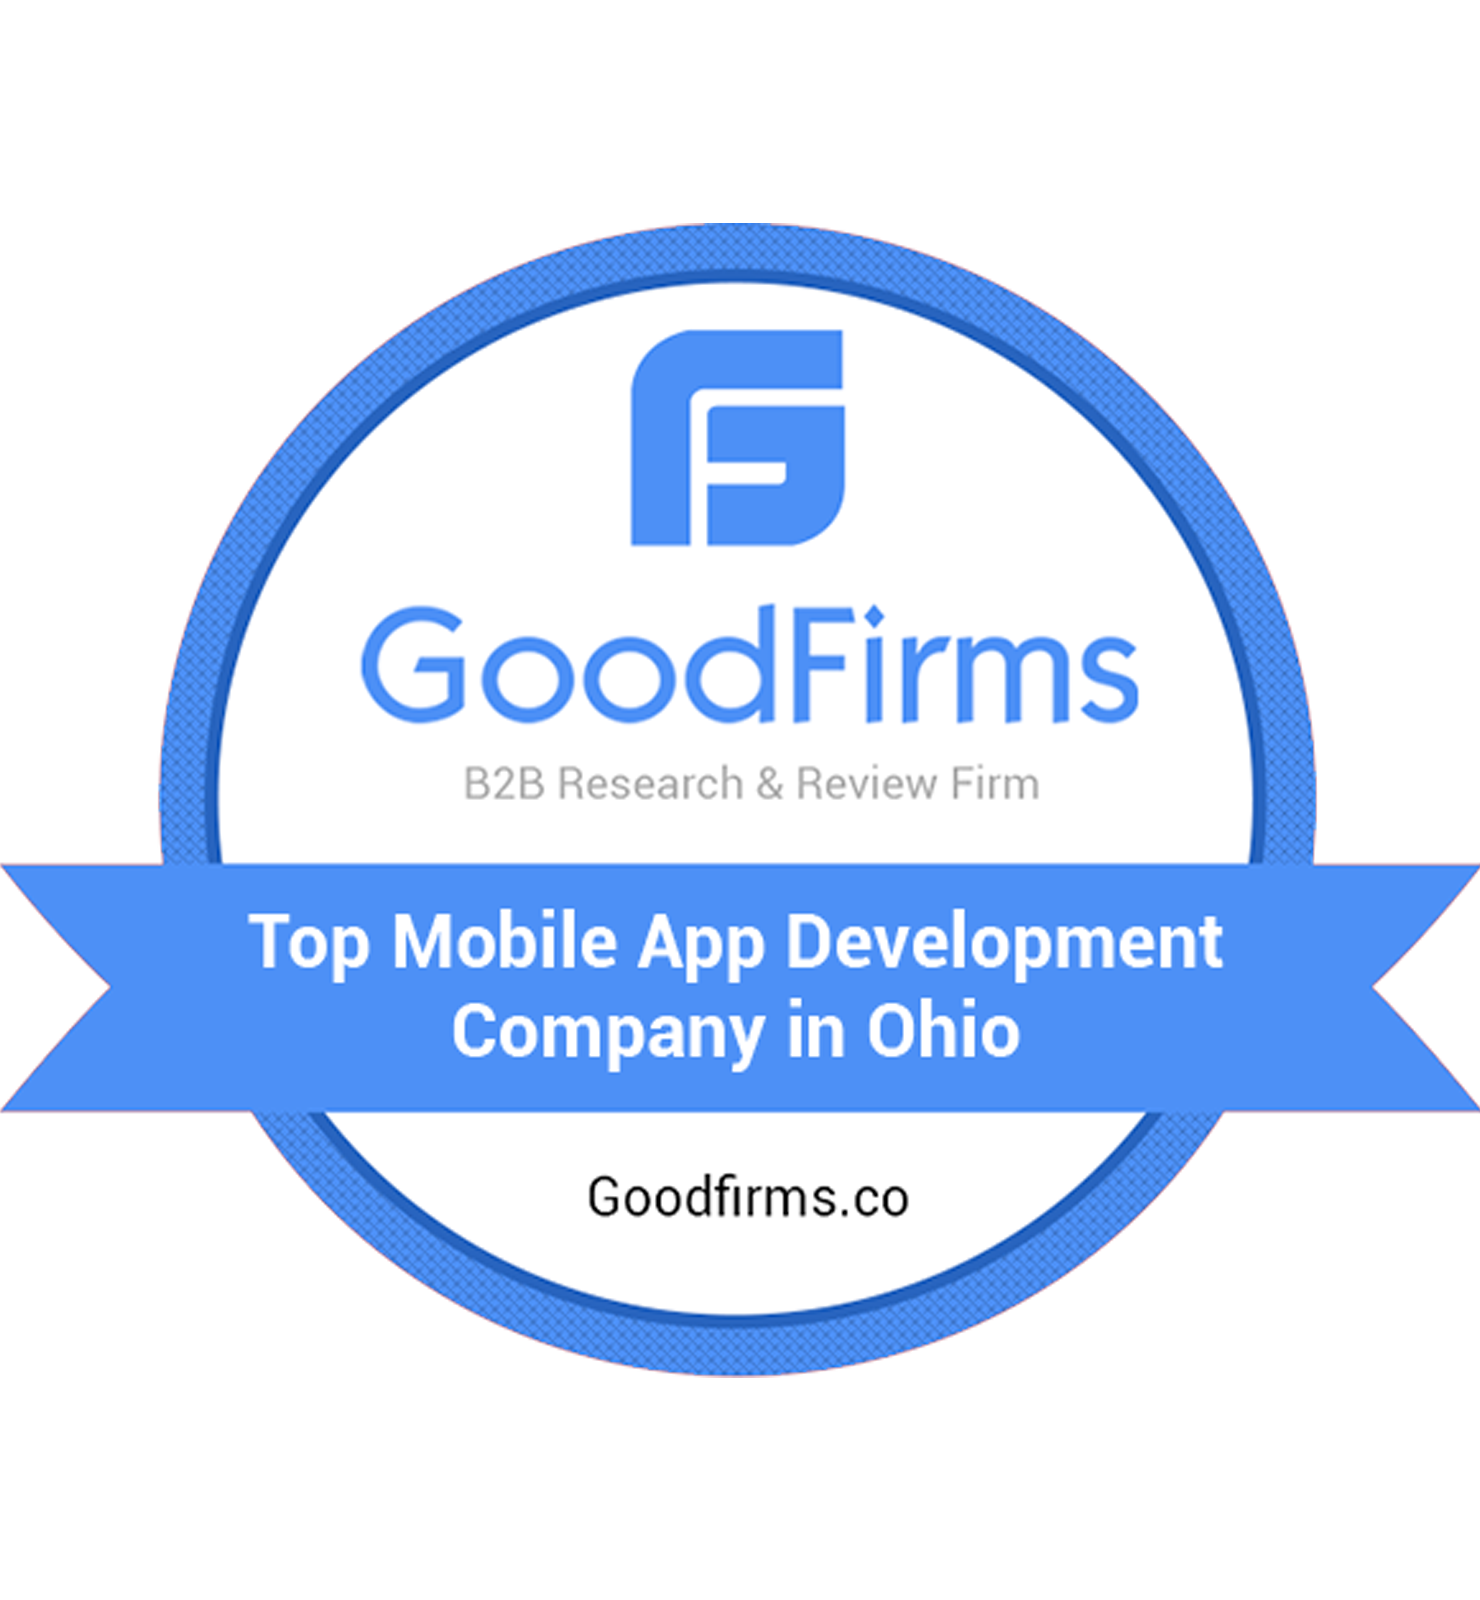 GoodFirms Top Mobile App Development in Ohio